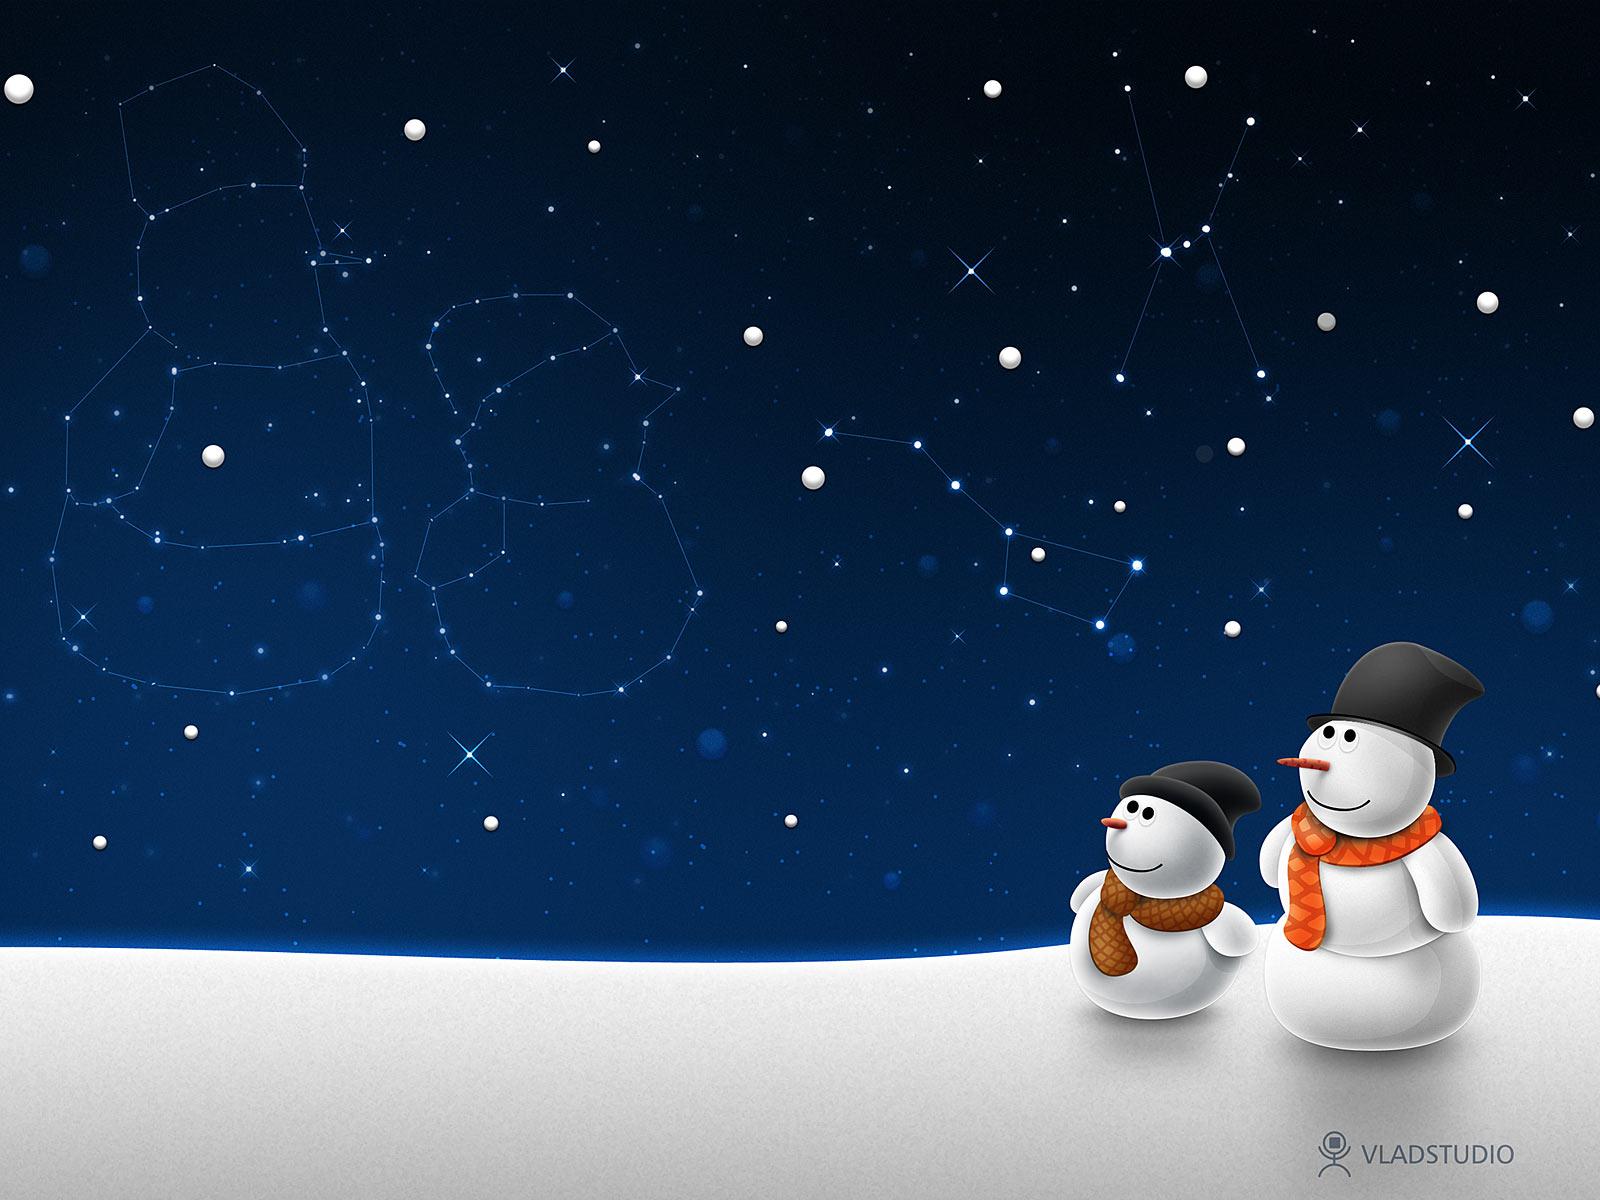 Animated Christmas Wallpaper christmas wallpaper for iphone 1600x1200